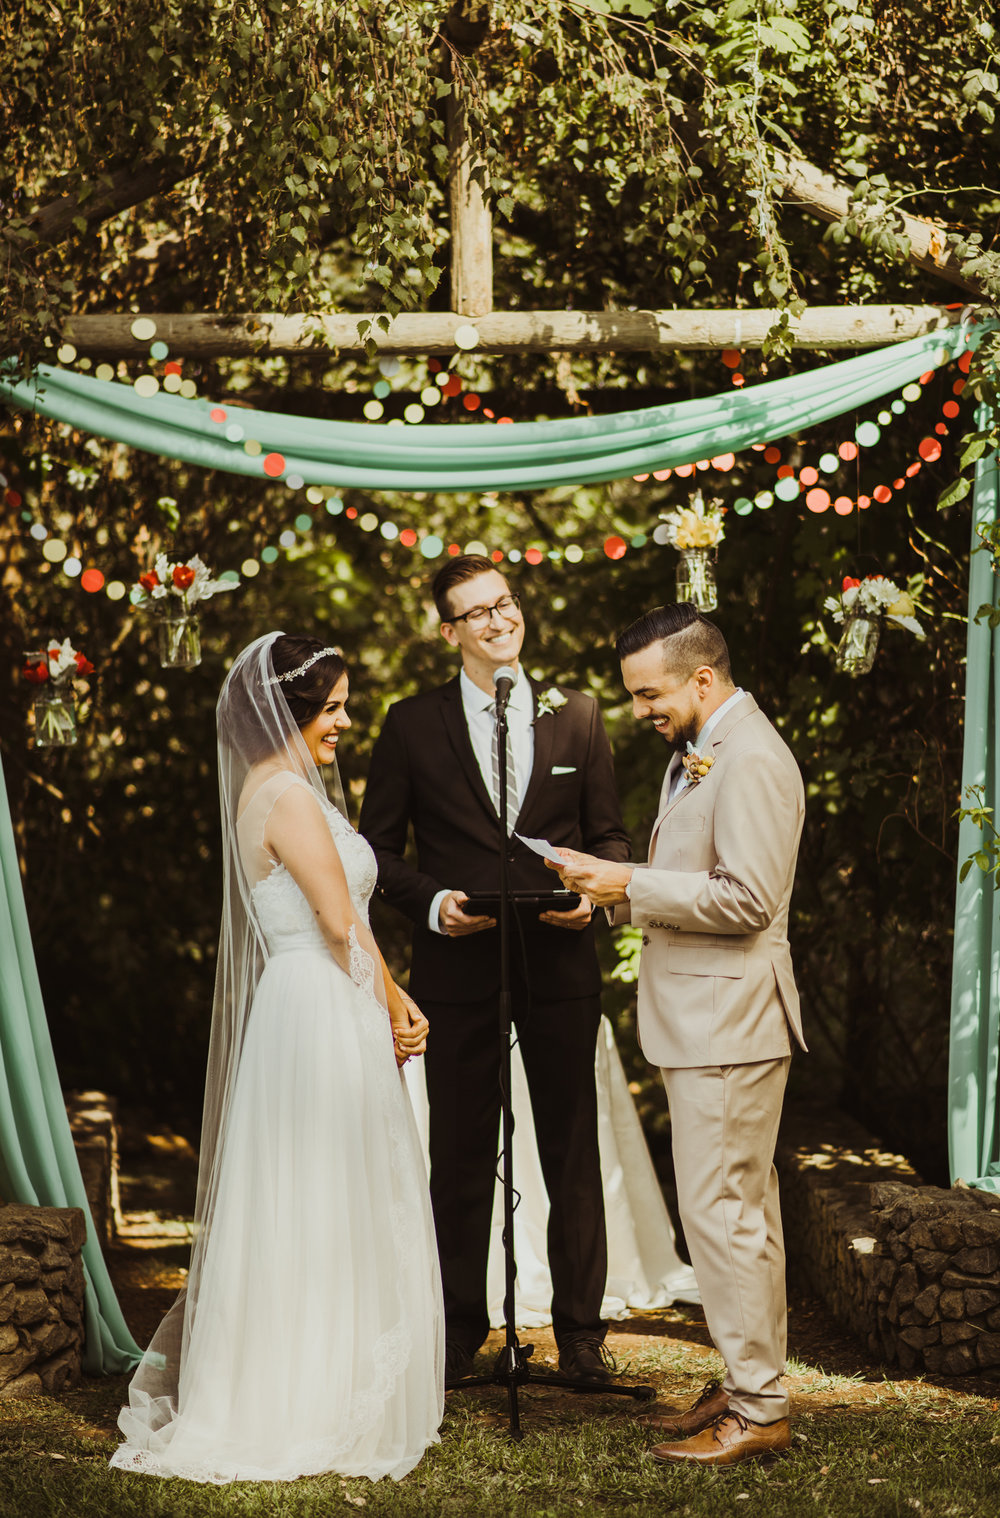 ©Isaiah + Taylor Photography - Brendan + Stefana, Quail Haven Farm Wedding, Vista-66.jpg